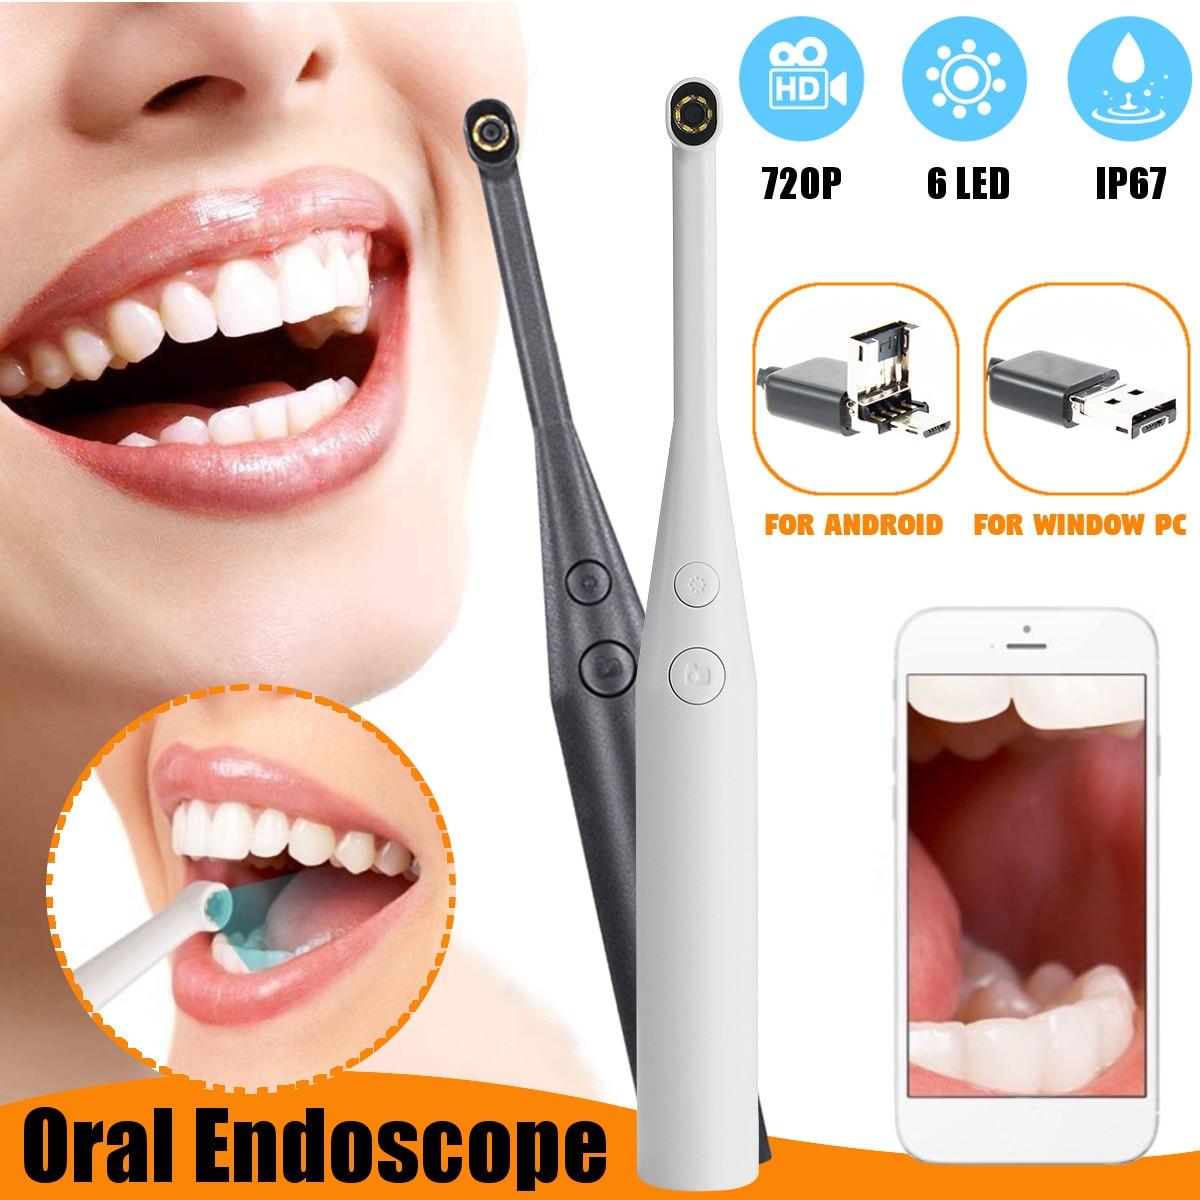 WIFI Wireless USB Dental HD Intraoral Camera Endoscope LED Light Waterproof Oral Dental Endoscope  Mirror Whitening